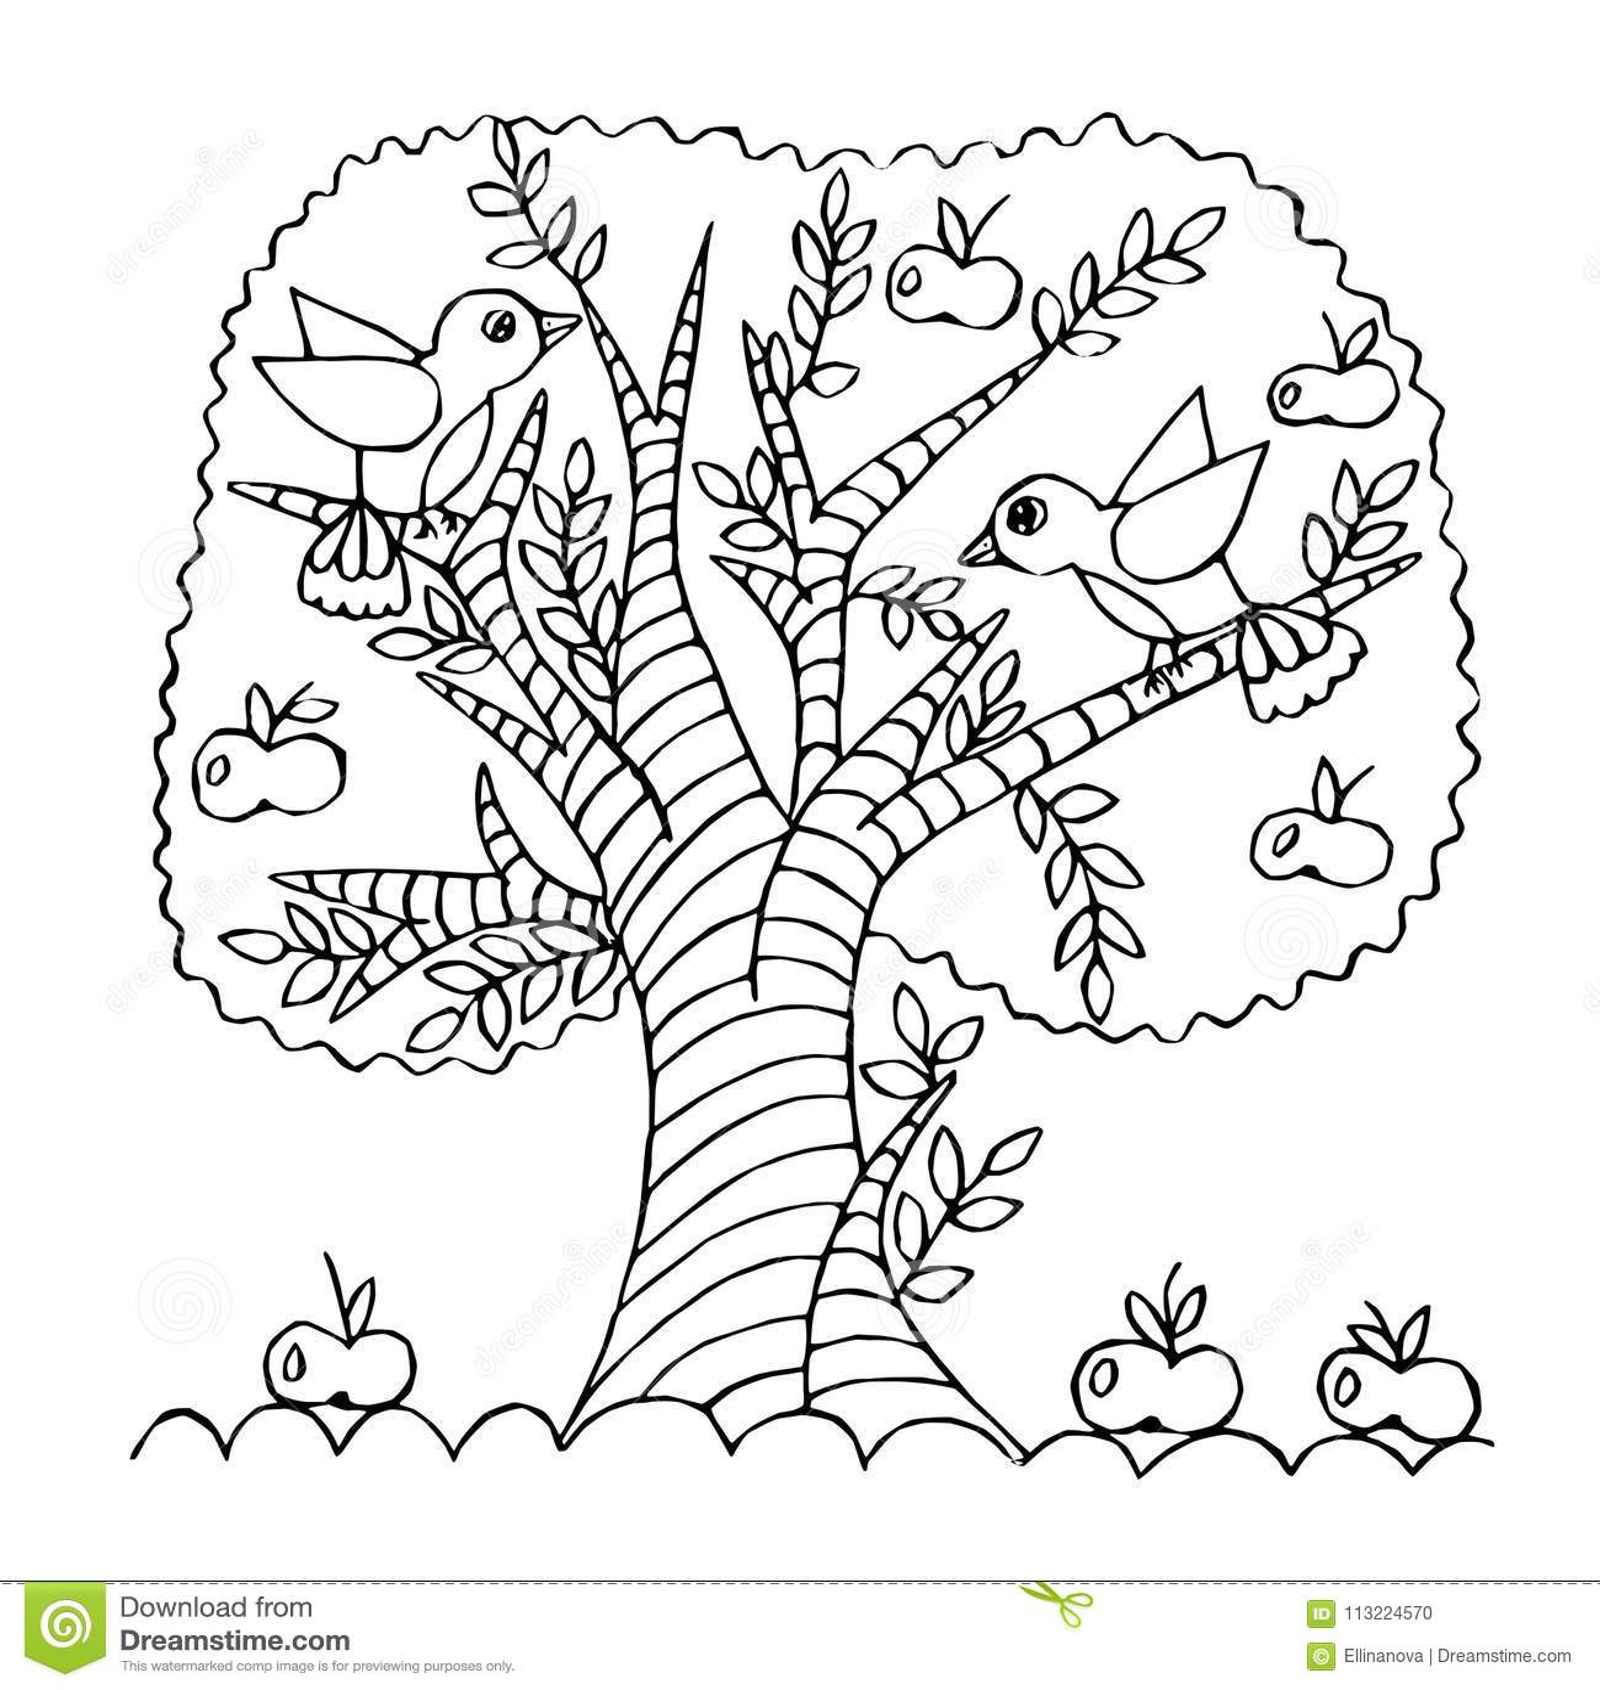 Arvore De Maca Dos Desenhos Animados Isolada No Fundo Branco